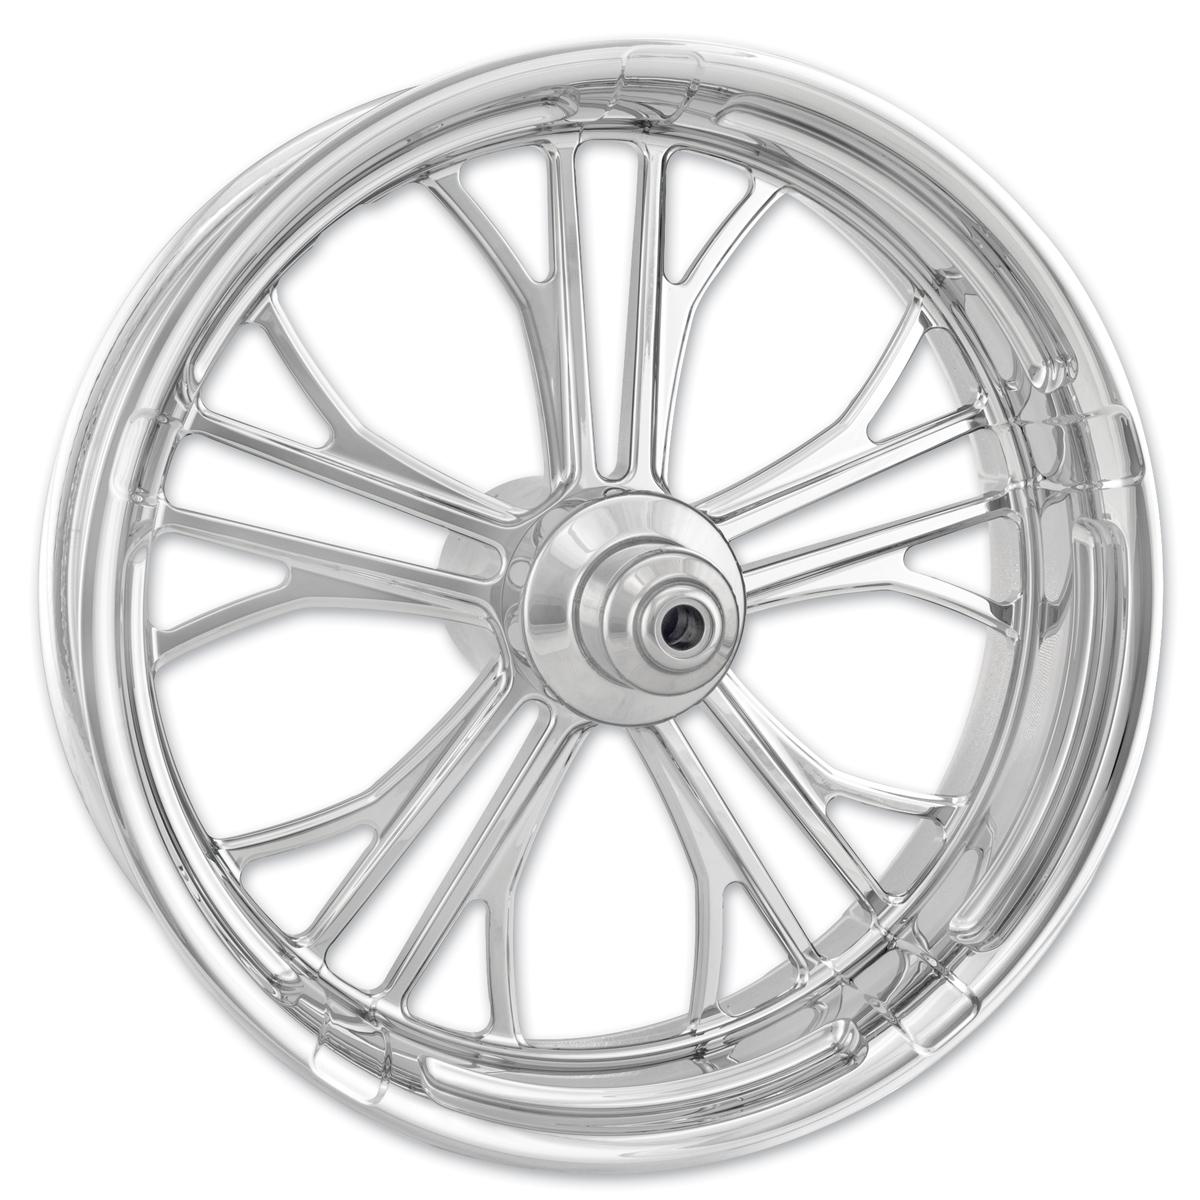 Performance Machine Dixon Chrome Front Wheel, 21